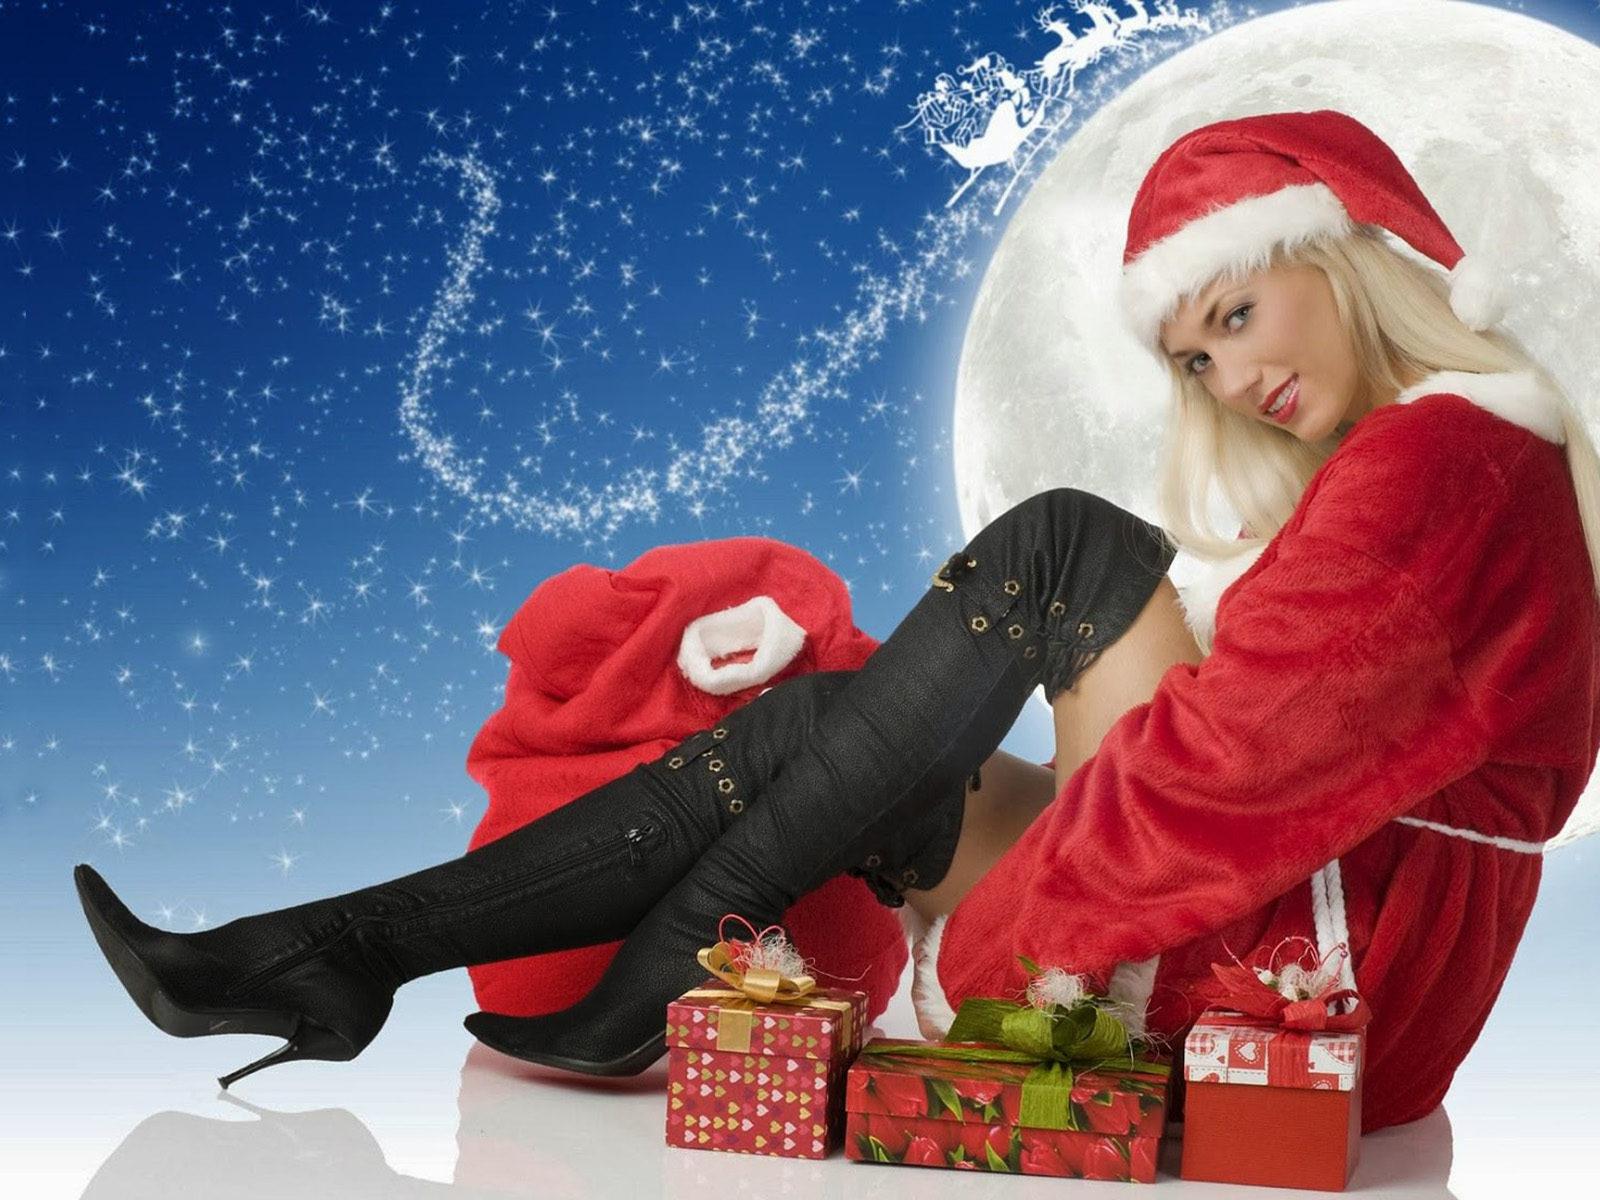 Www New Hd Girl Wallpaper Com Happy New Year Santa Claus Girl Hd Wallpaper 1920x1200